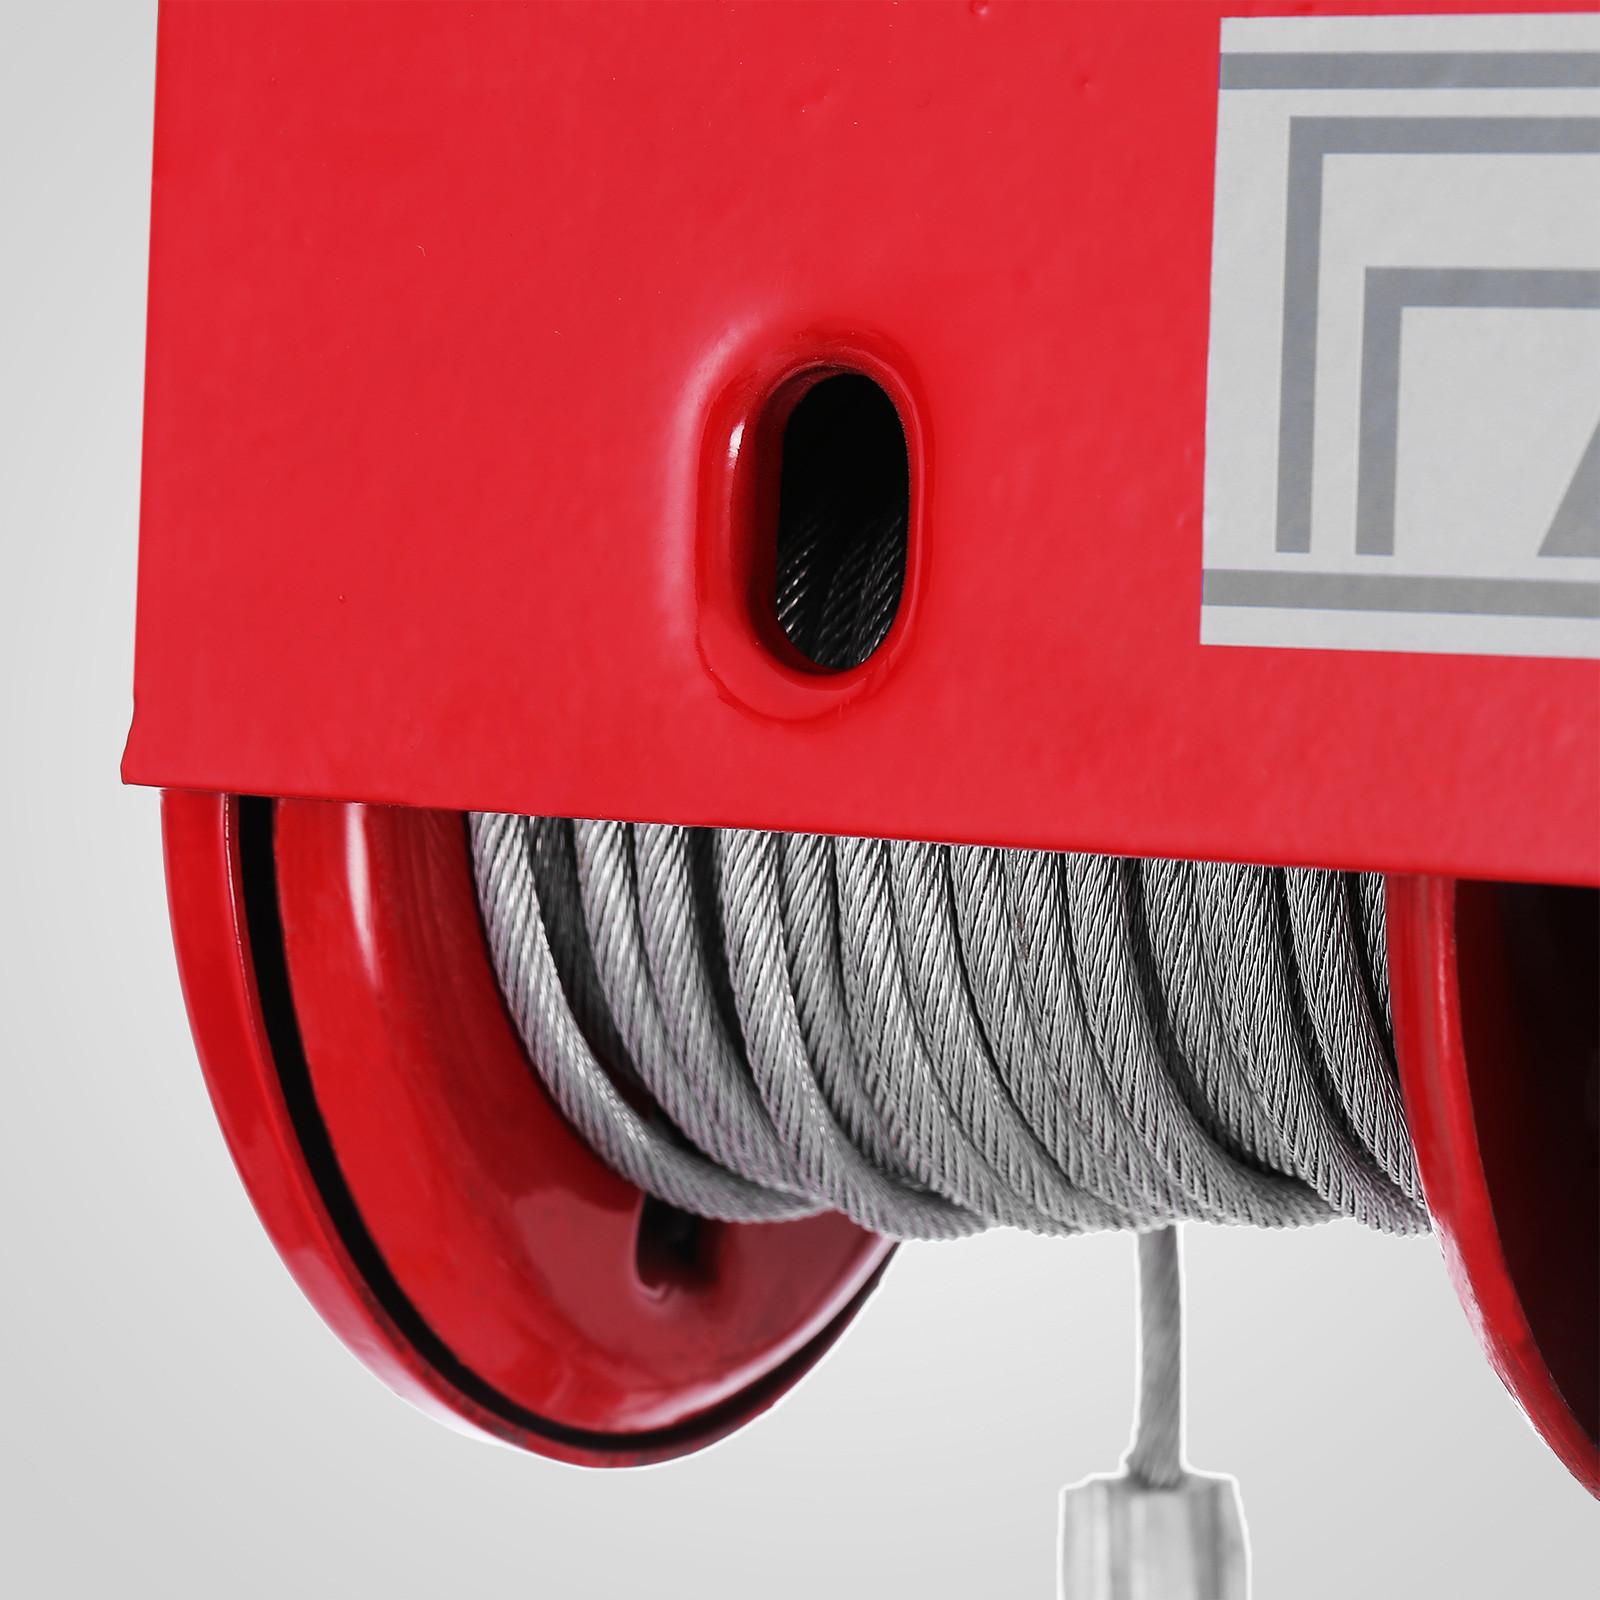 100kg-900kg-Electric-Hoist-Winch-Lifting-Engine-Crane-Cable-Lift-Hook-Garage miniature 44